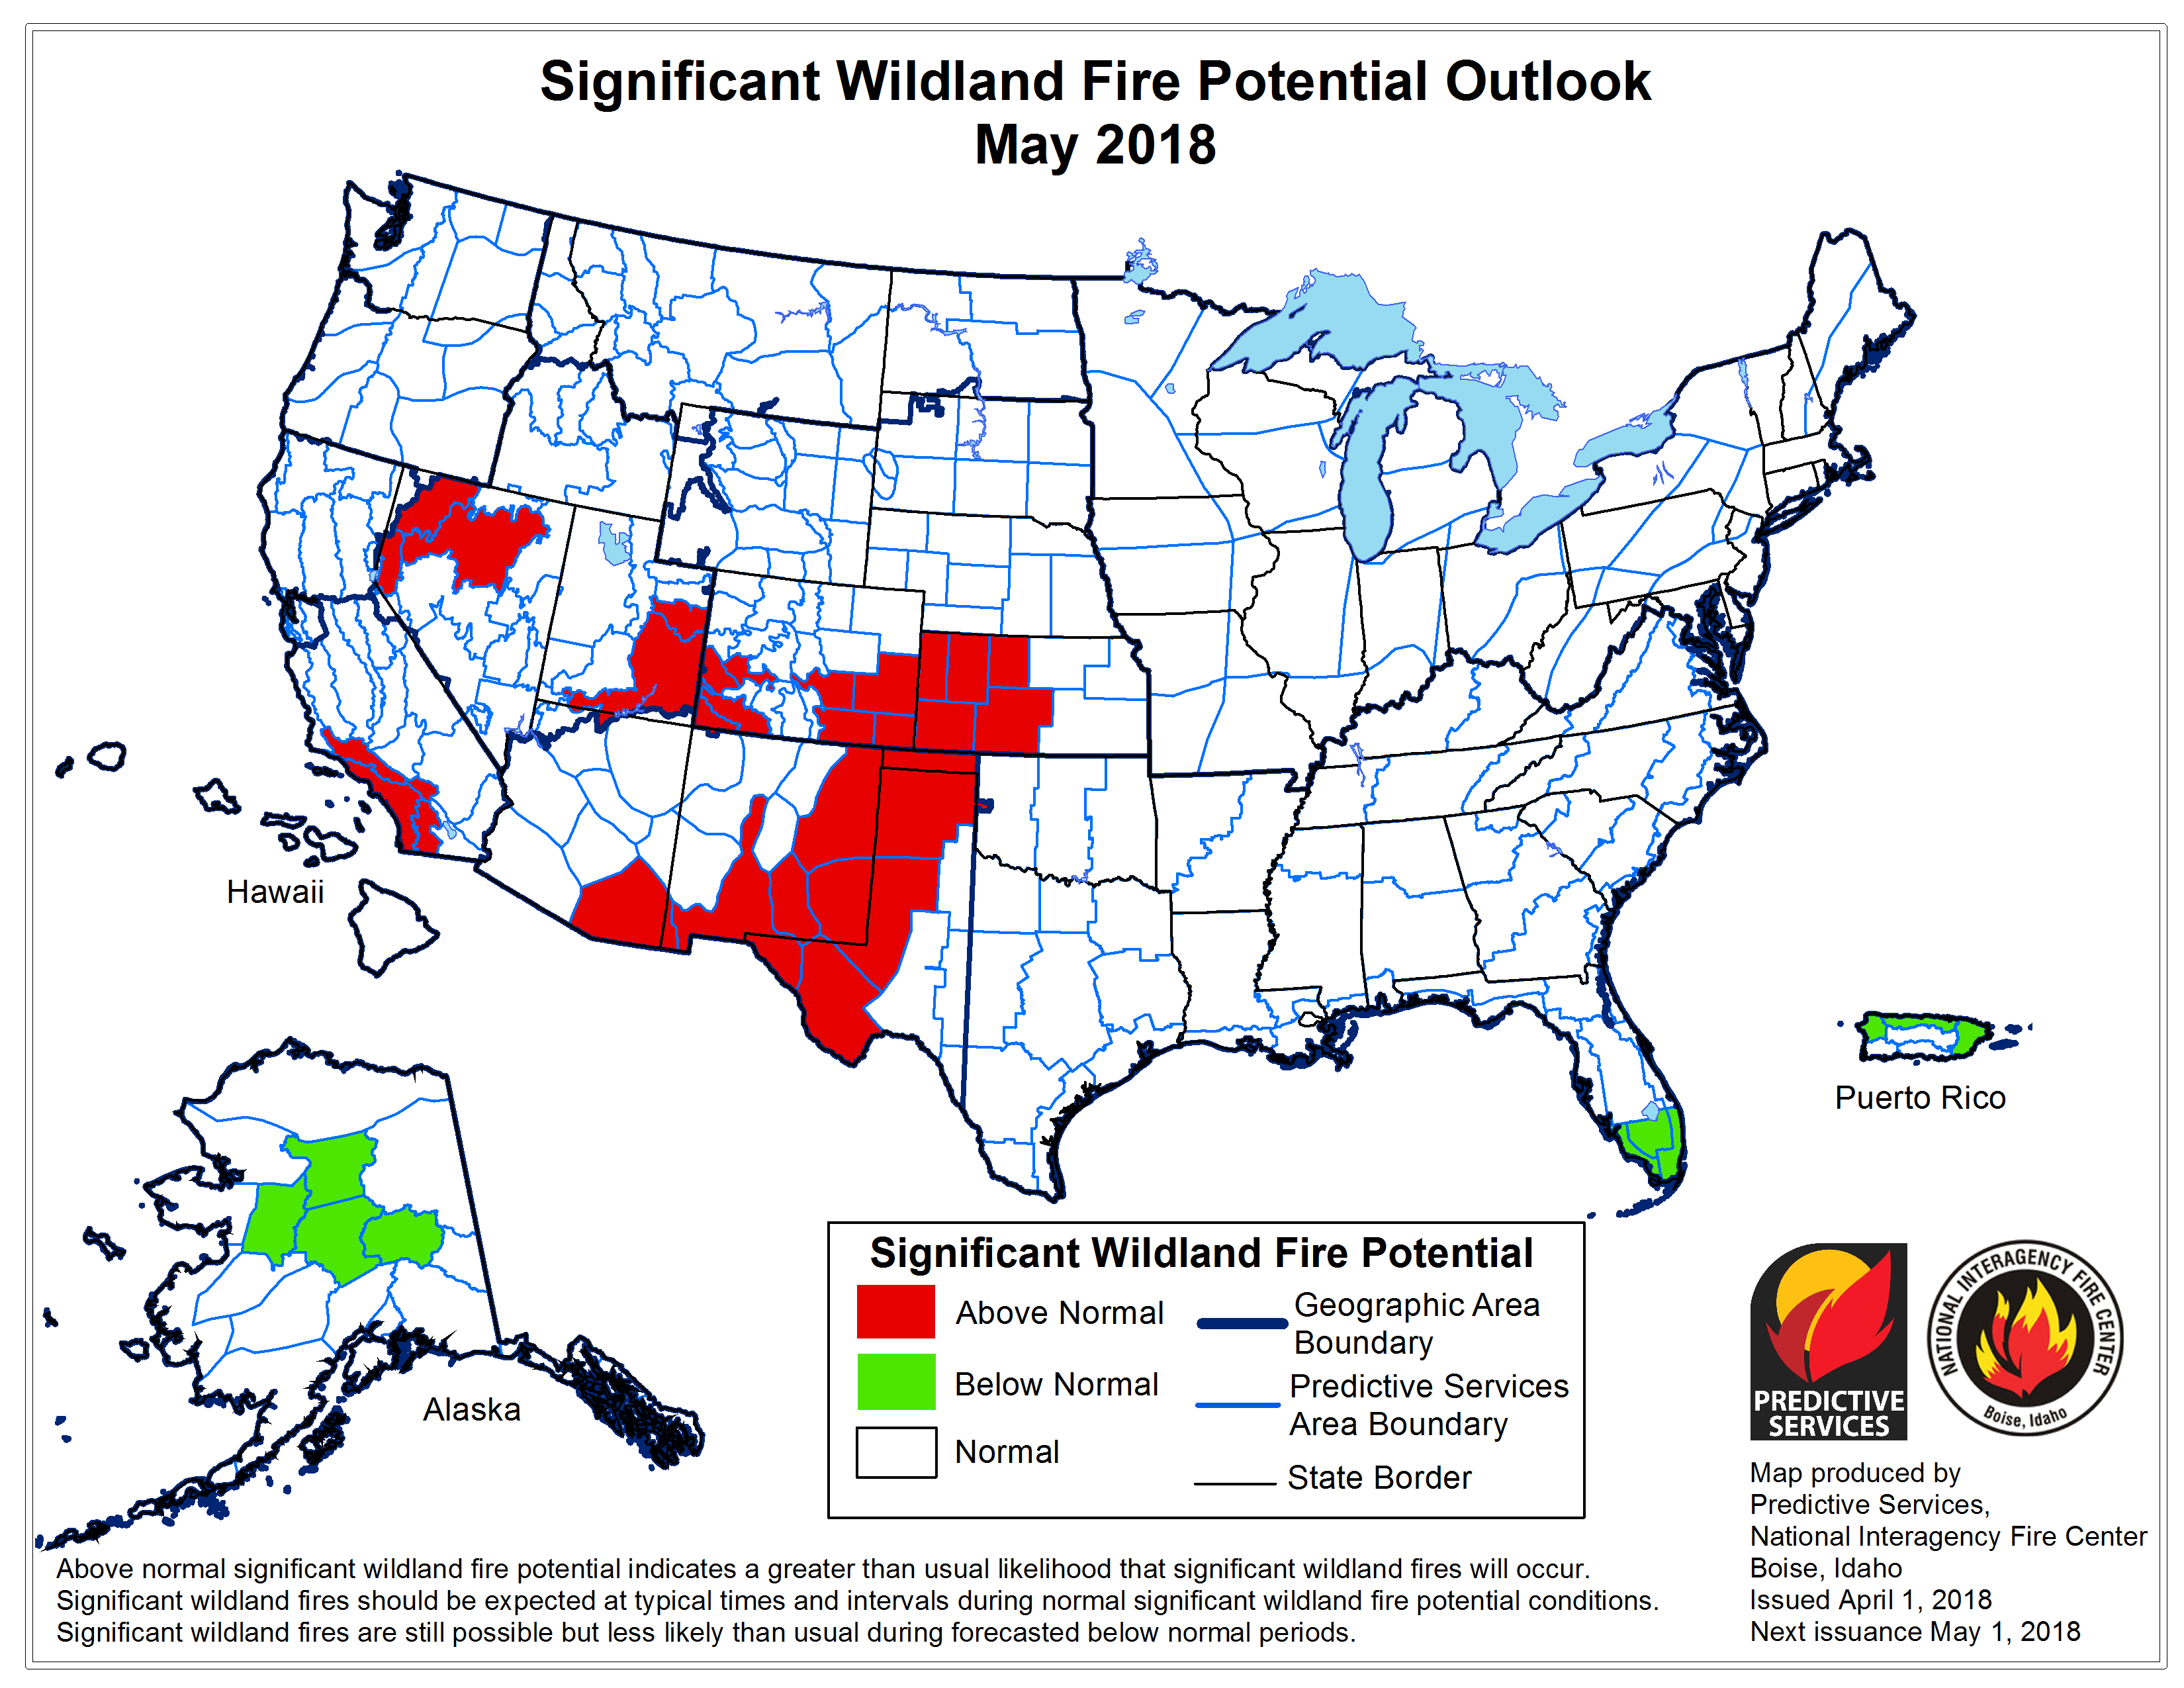 Wildland Fire Potential